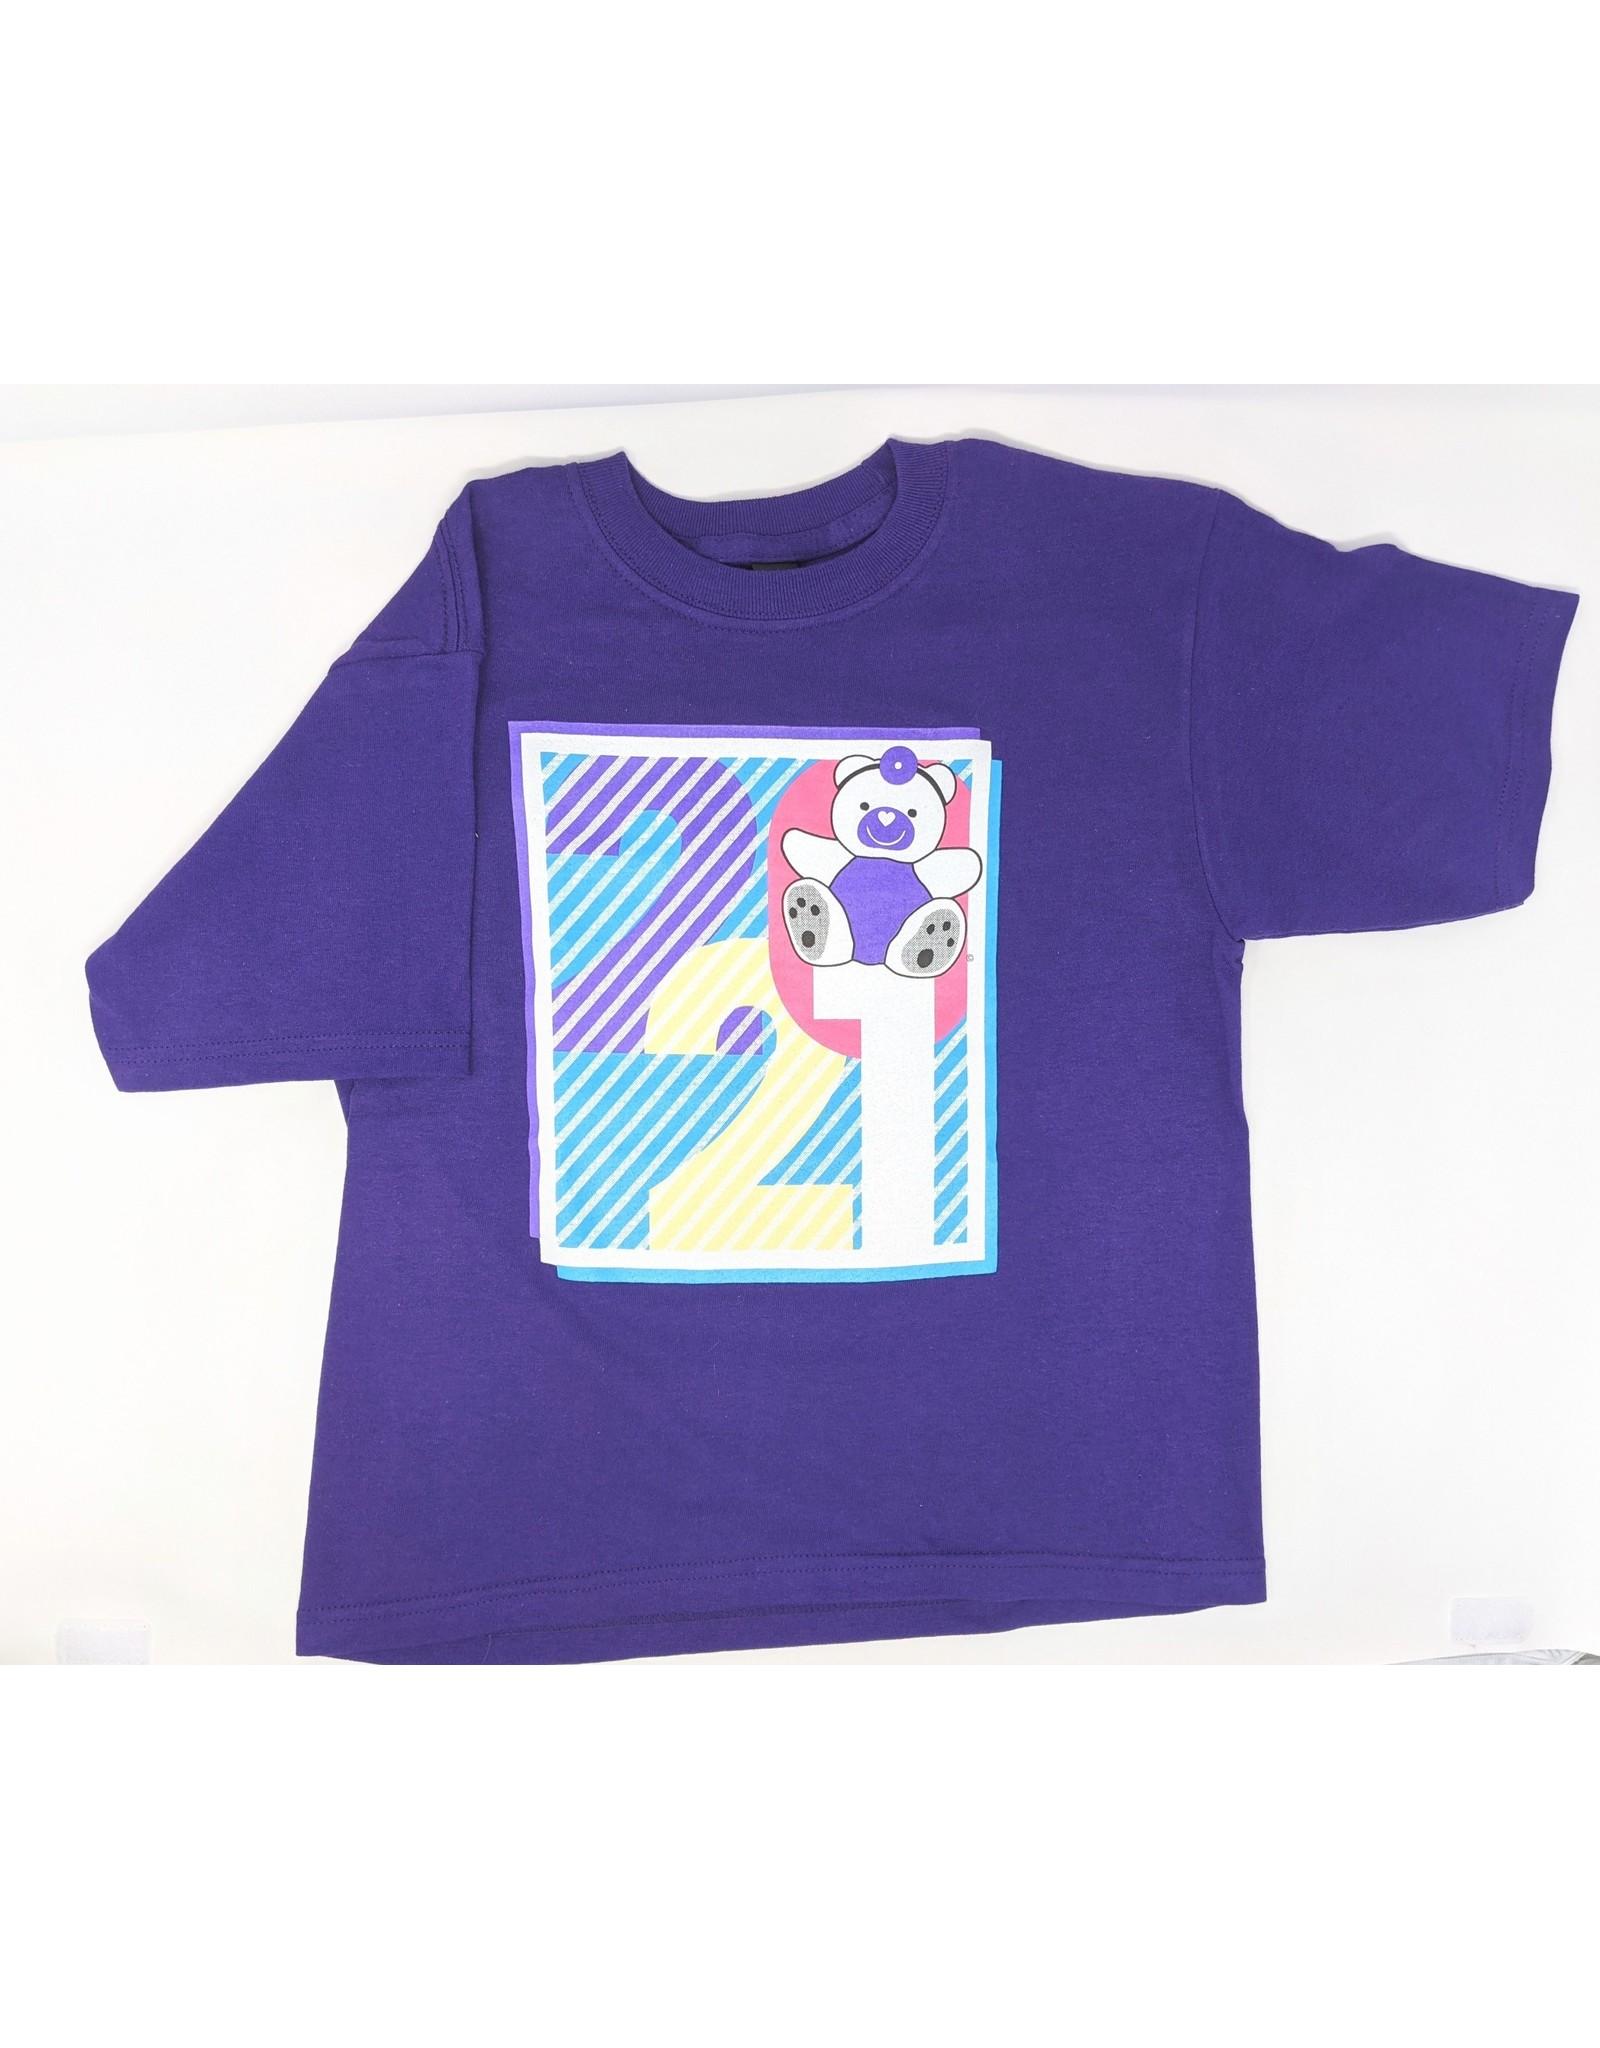 2021 Children's T-Shirt - purple